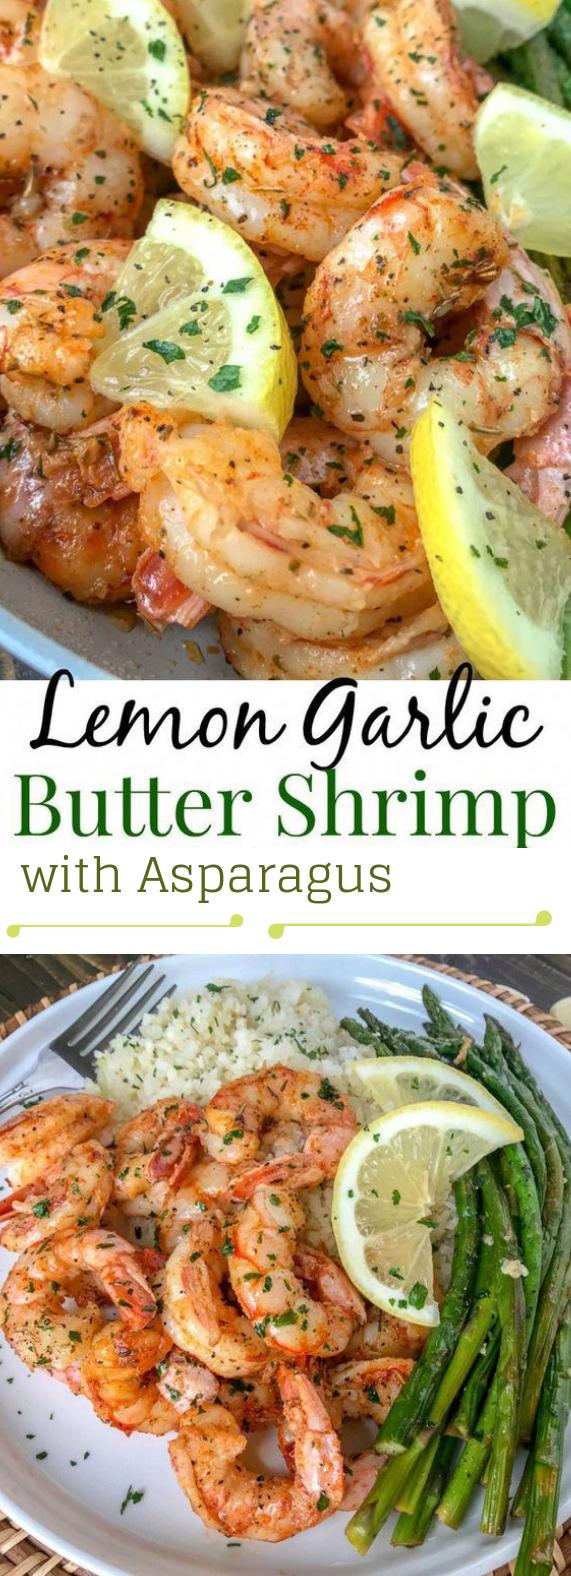 Lemon Garlic Butter Shrimp with Asparagus #healthyeat #dinner